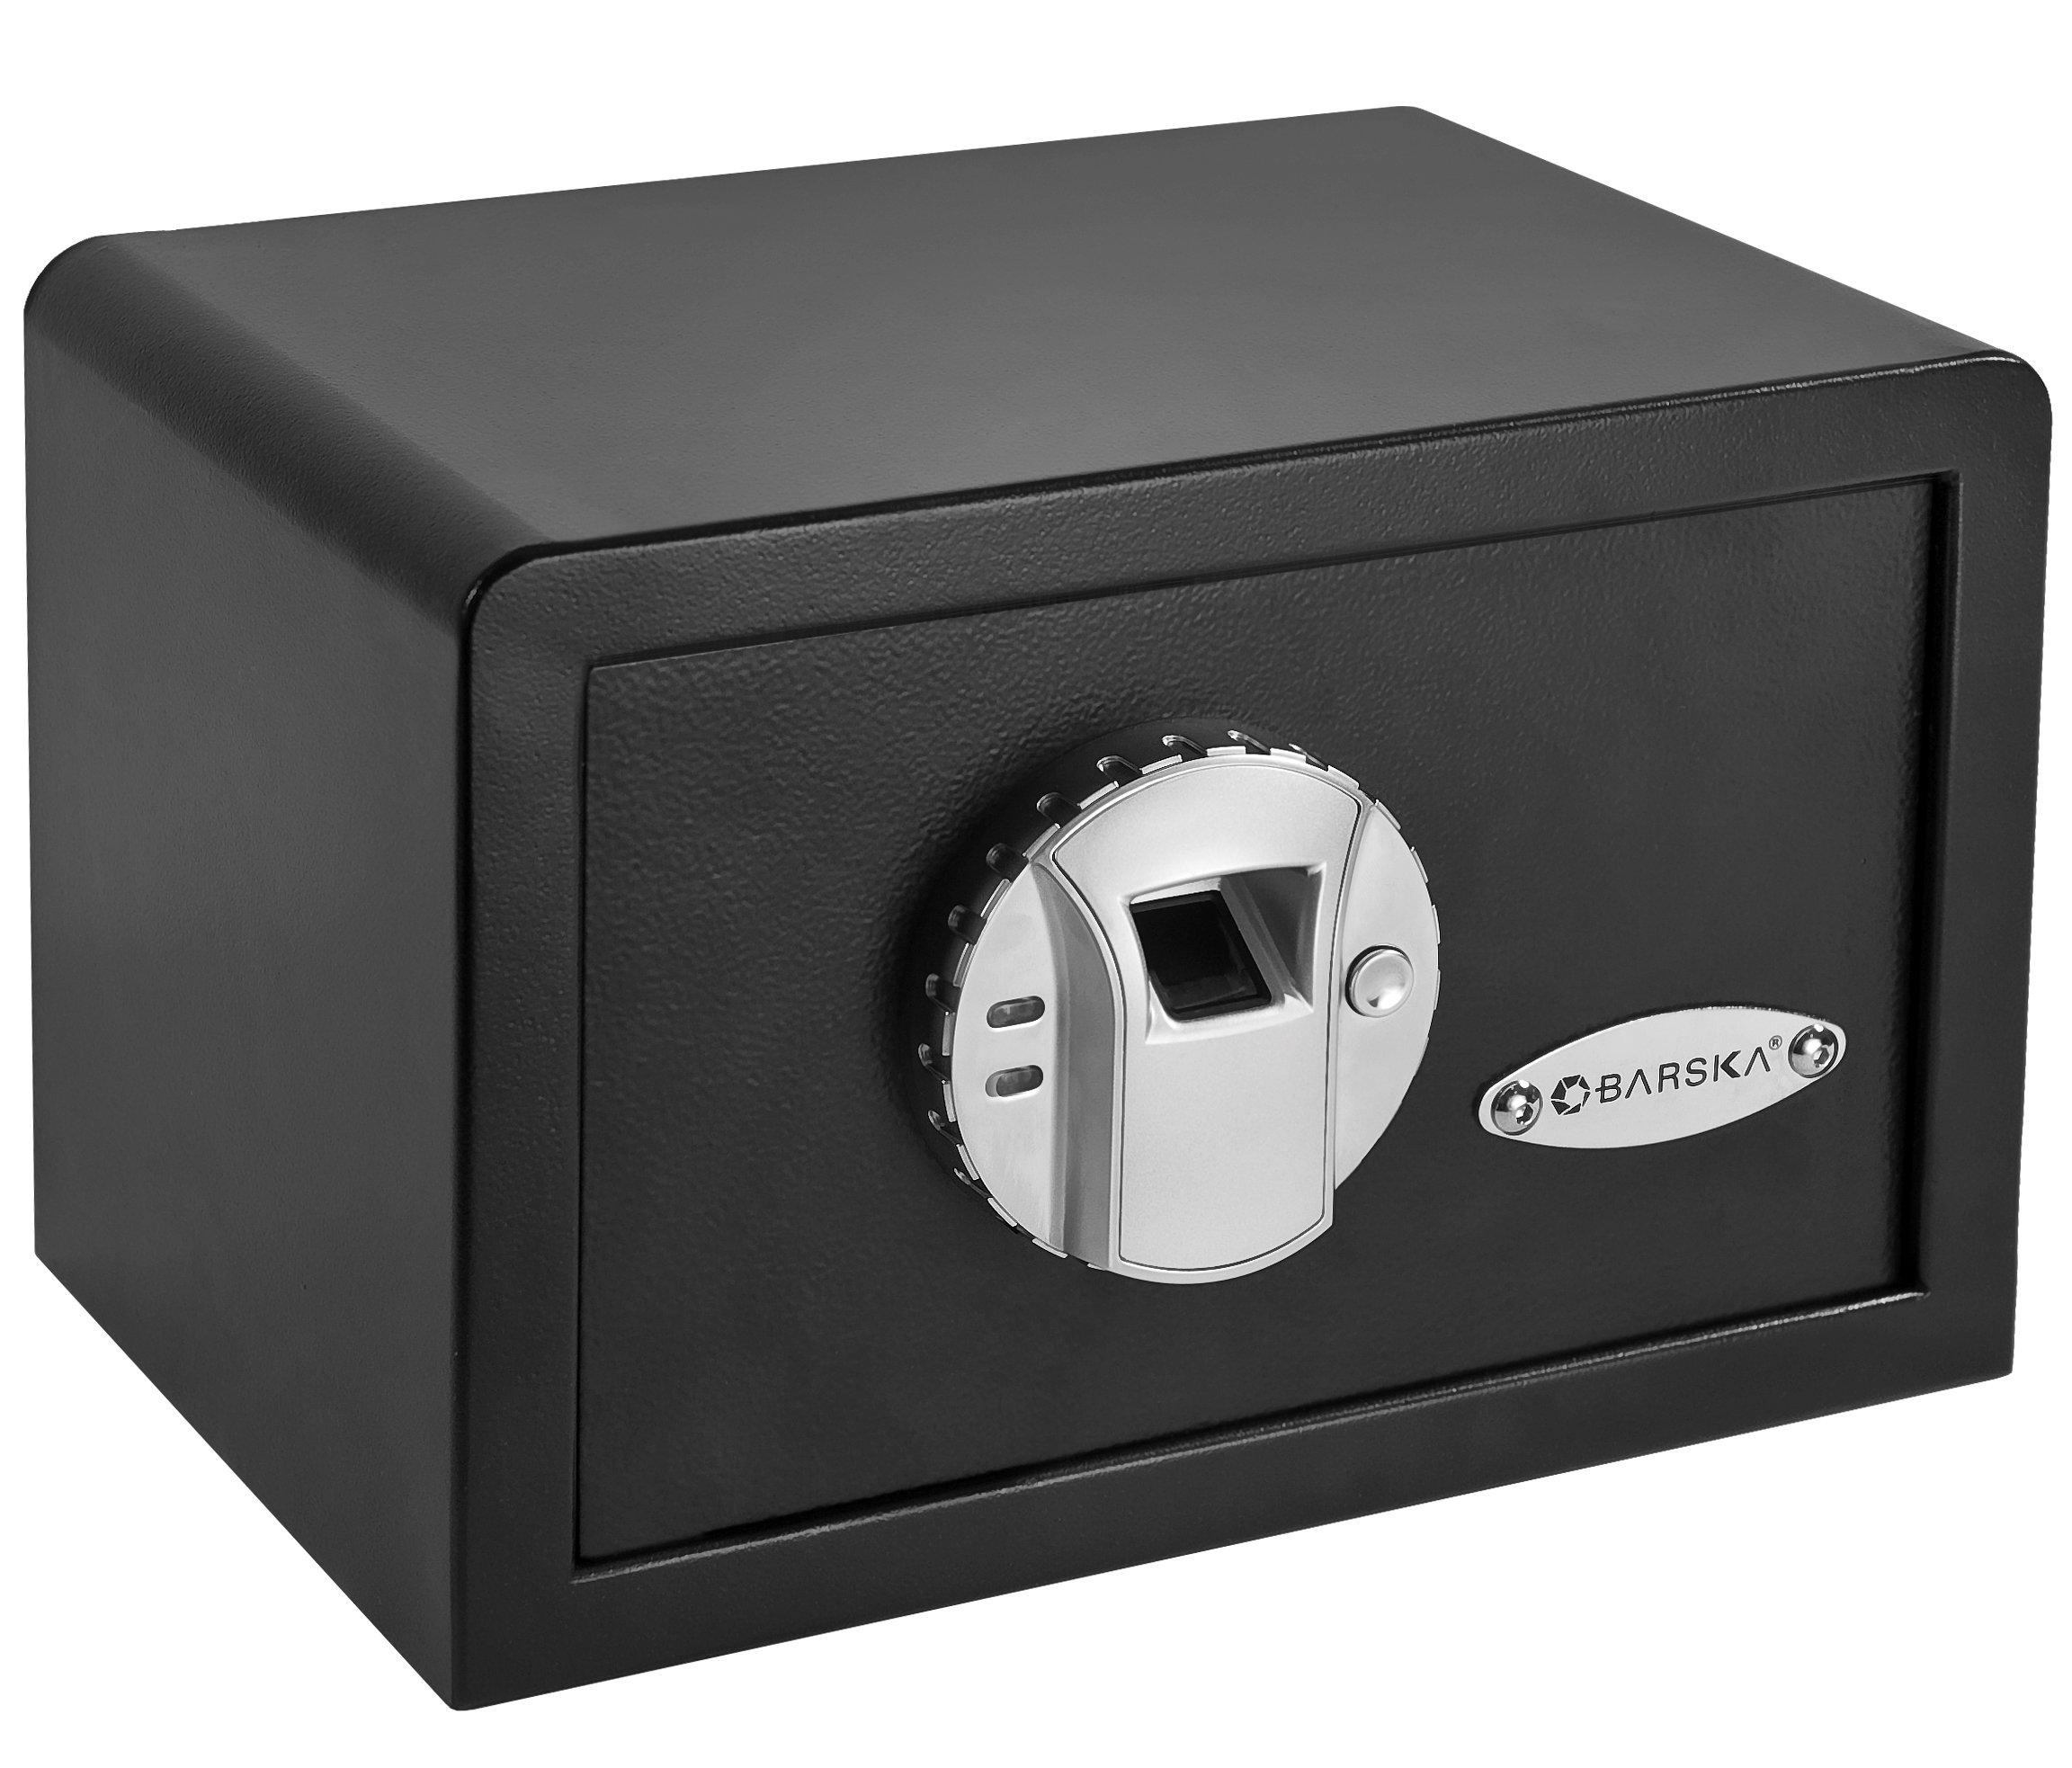 BARSKA AX11620 Biometric Fingerprint Mini Security Home Safe Box 0.29 Cubic Ft by BARSKA